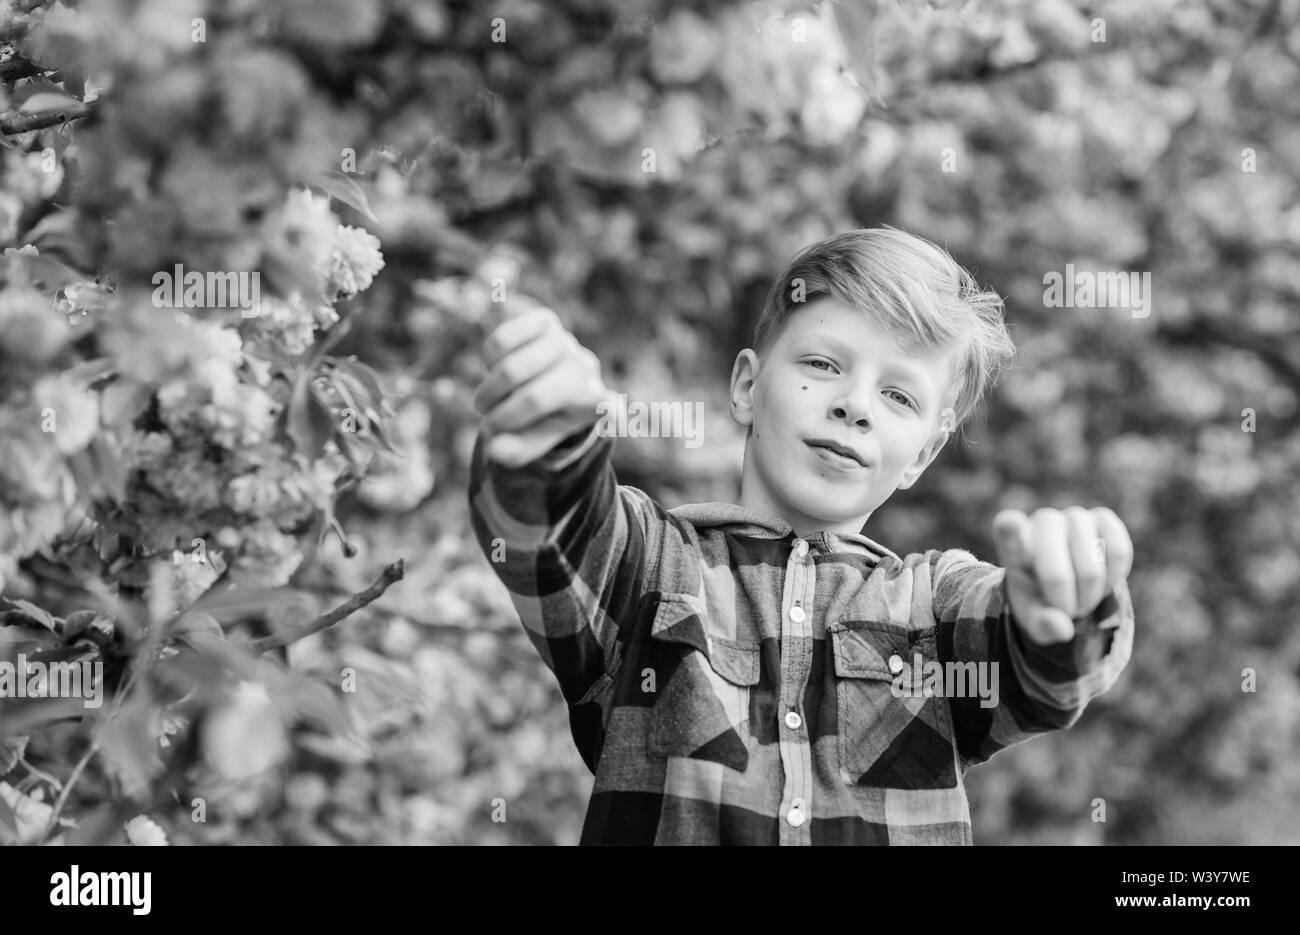 Guy disfrutando de flor de cerezo sakura. Tierna flor. Lindo niño disfruta del cálido día de primavera. Visita Sakura Garden. Boy teen posando cerca de Sakura. Niño en rosa Flores de sakura fondo de árbol. Concepto de botánica. Imagen De Stock